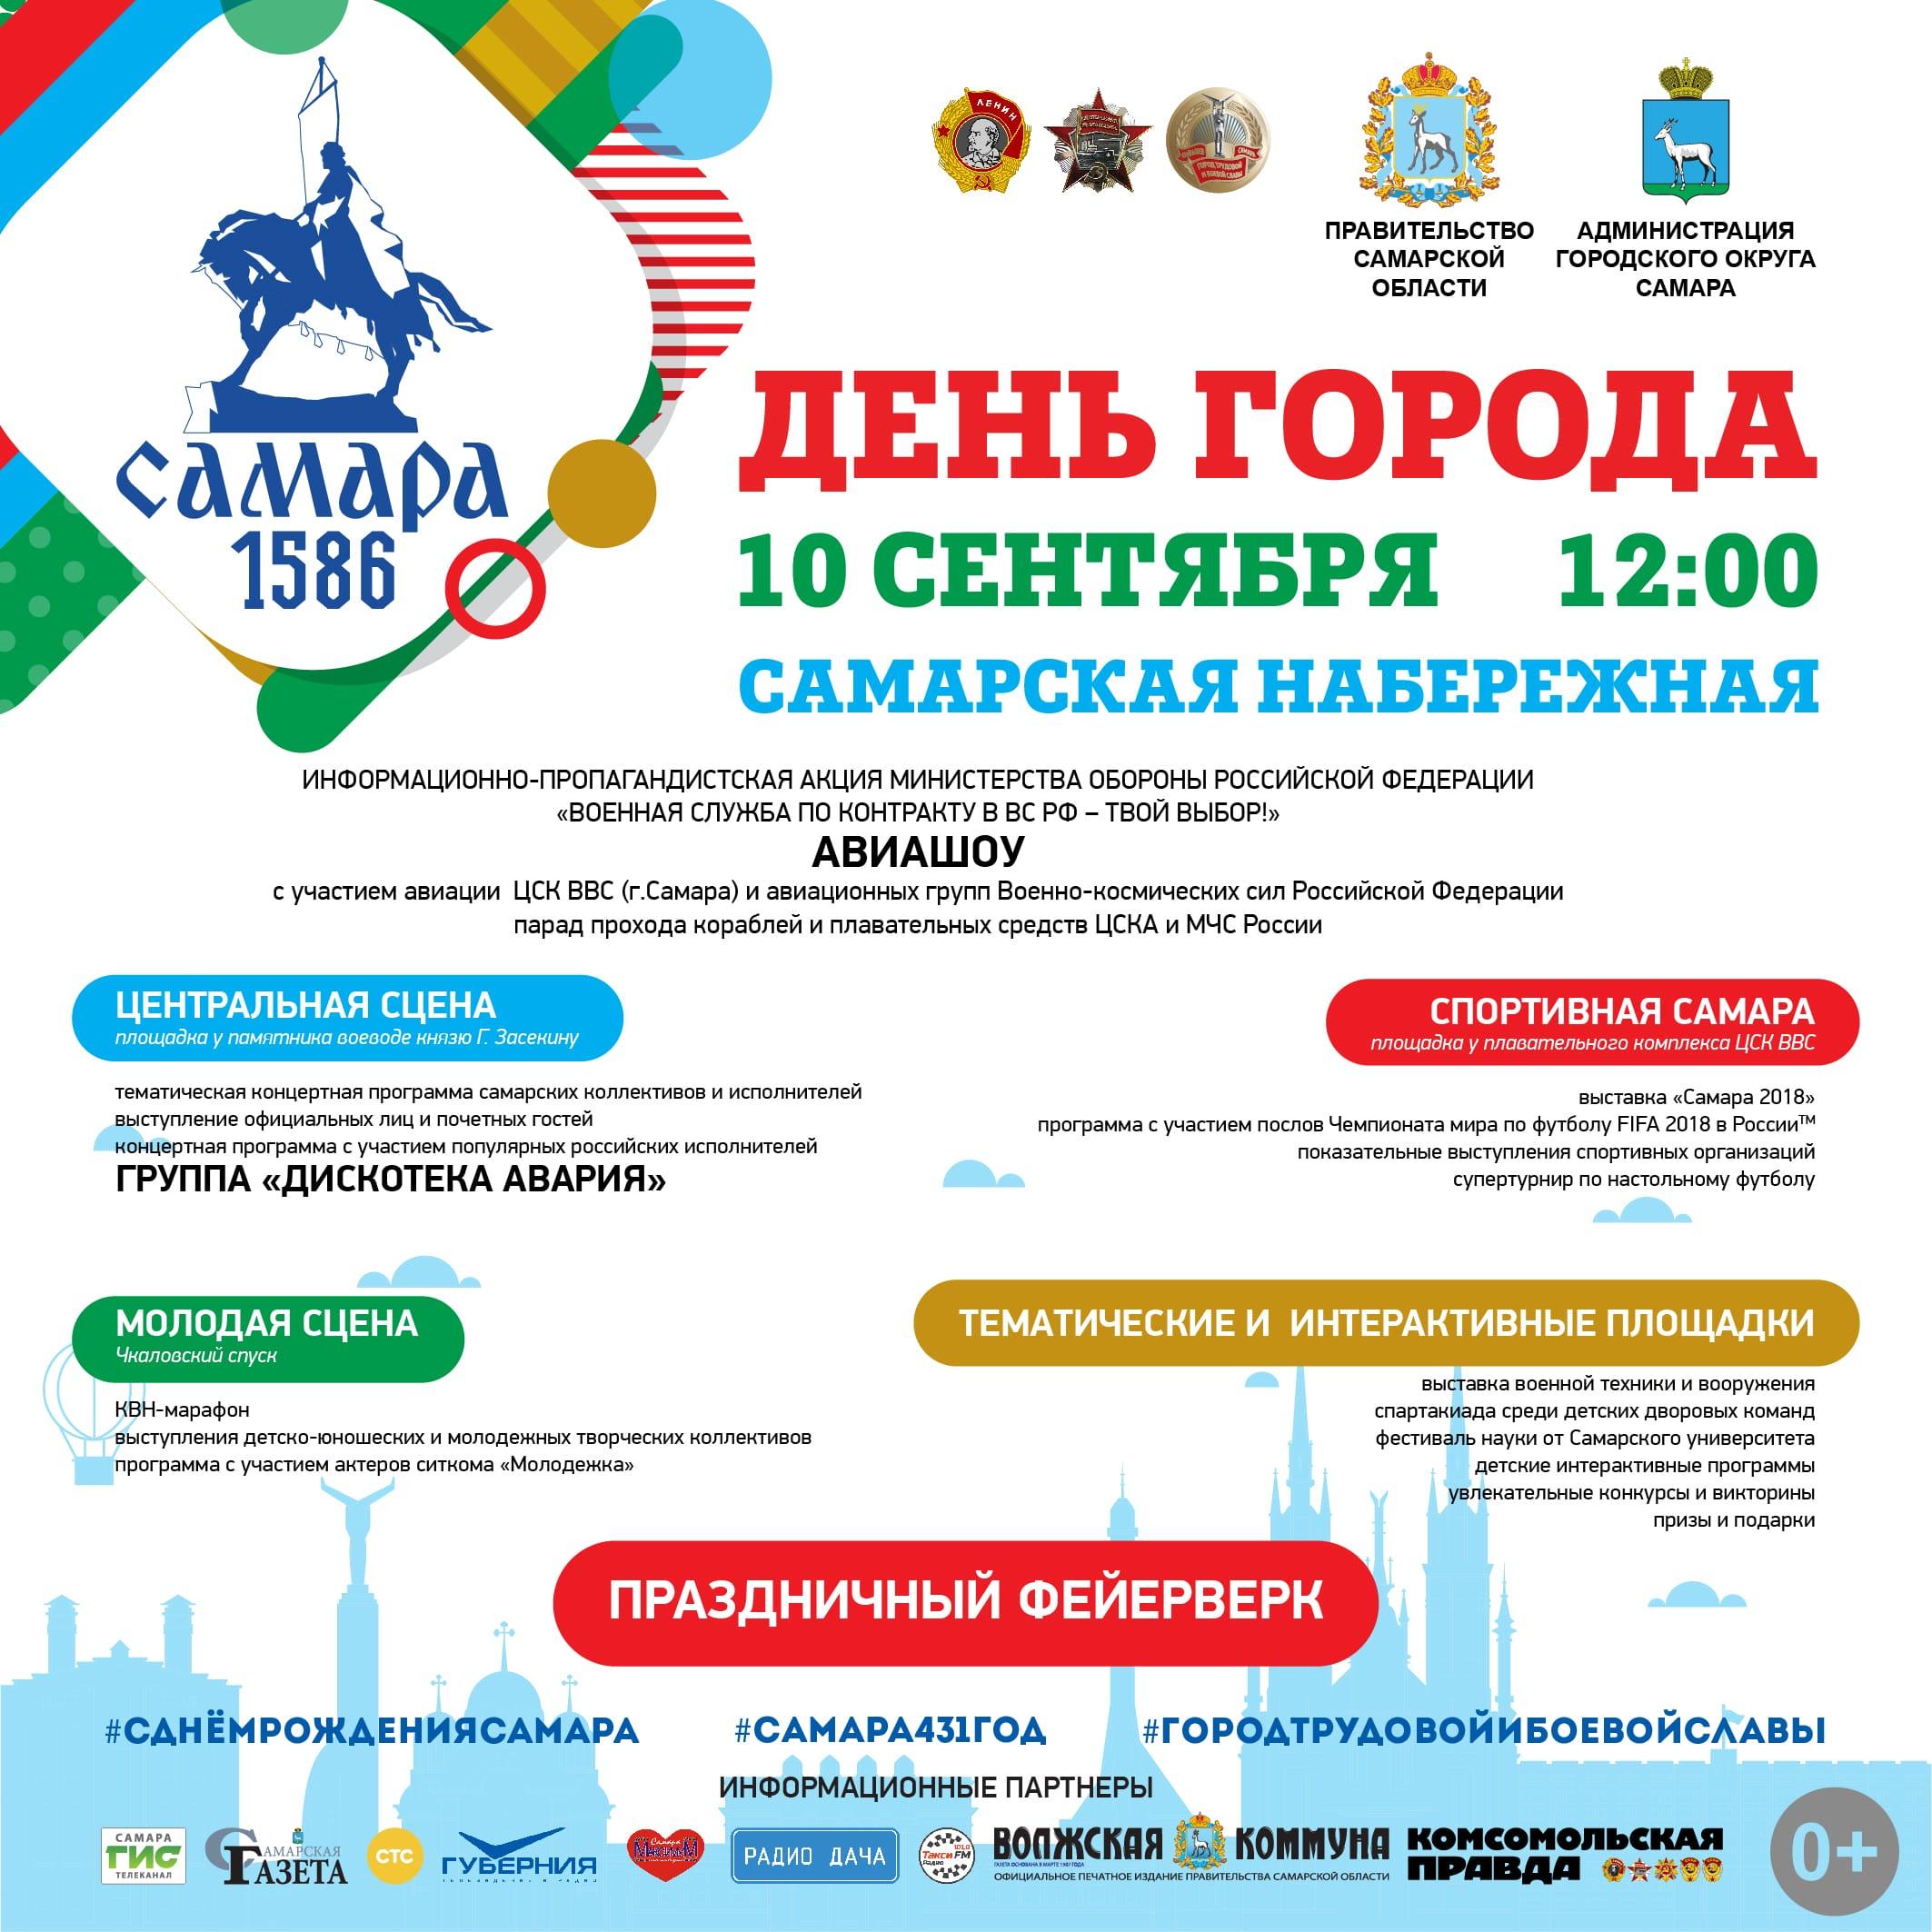 День города Самара 10 сентября 2017 года - программа мероприятий, когда салют